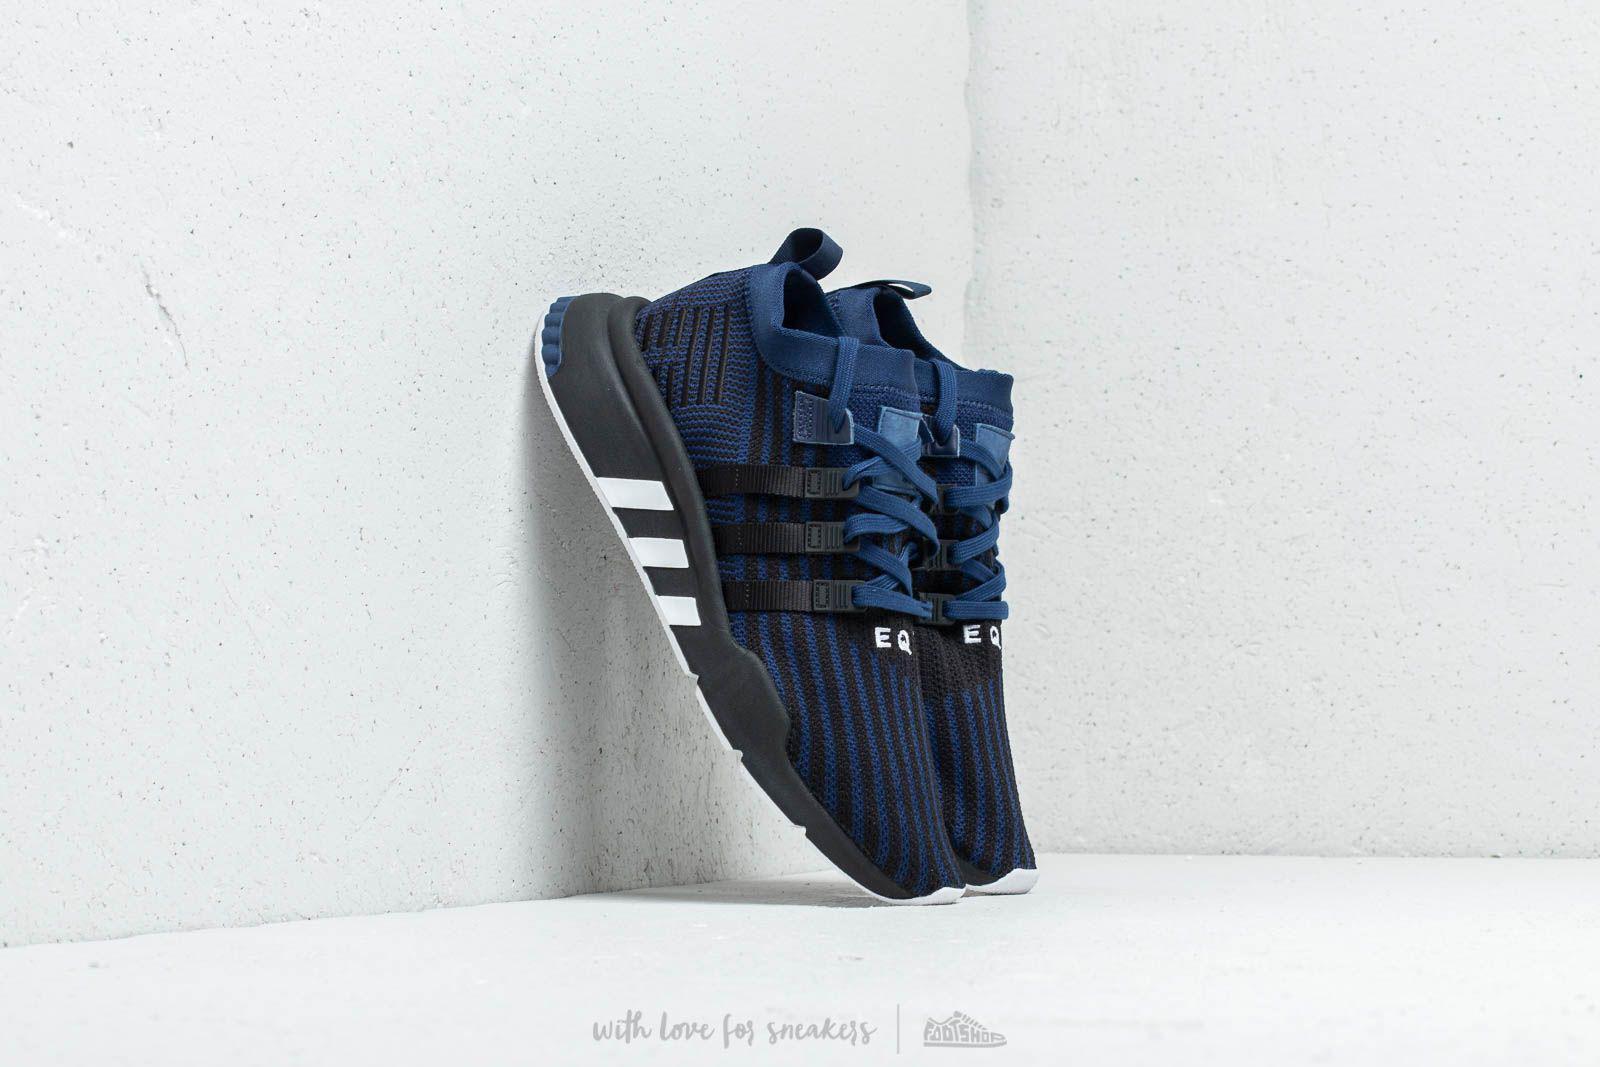 Adidas Eqt Support Mid Adv Pk Dark Blue/ Core Black/ Solar Yellow